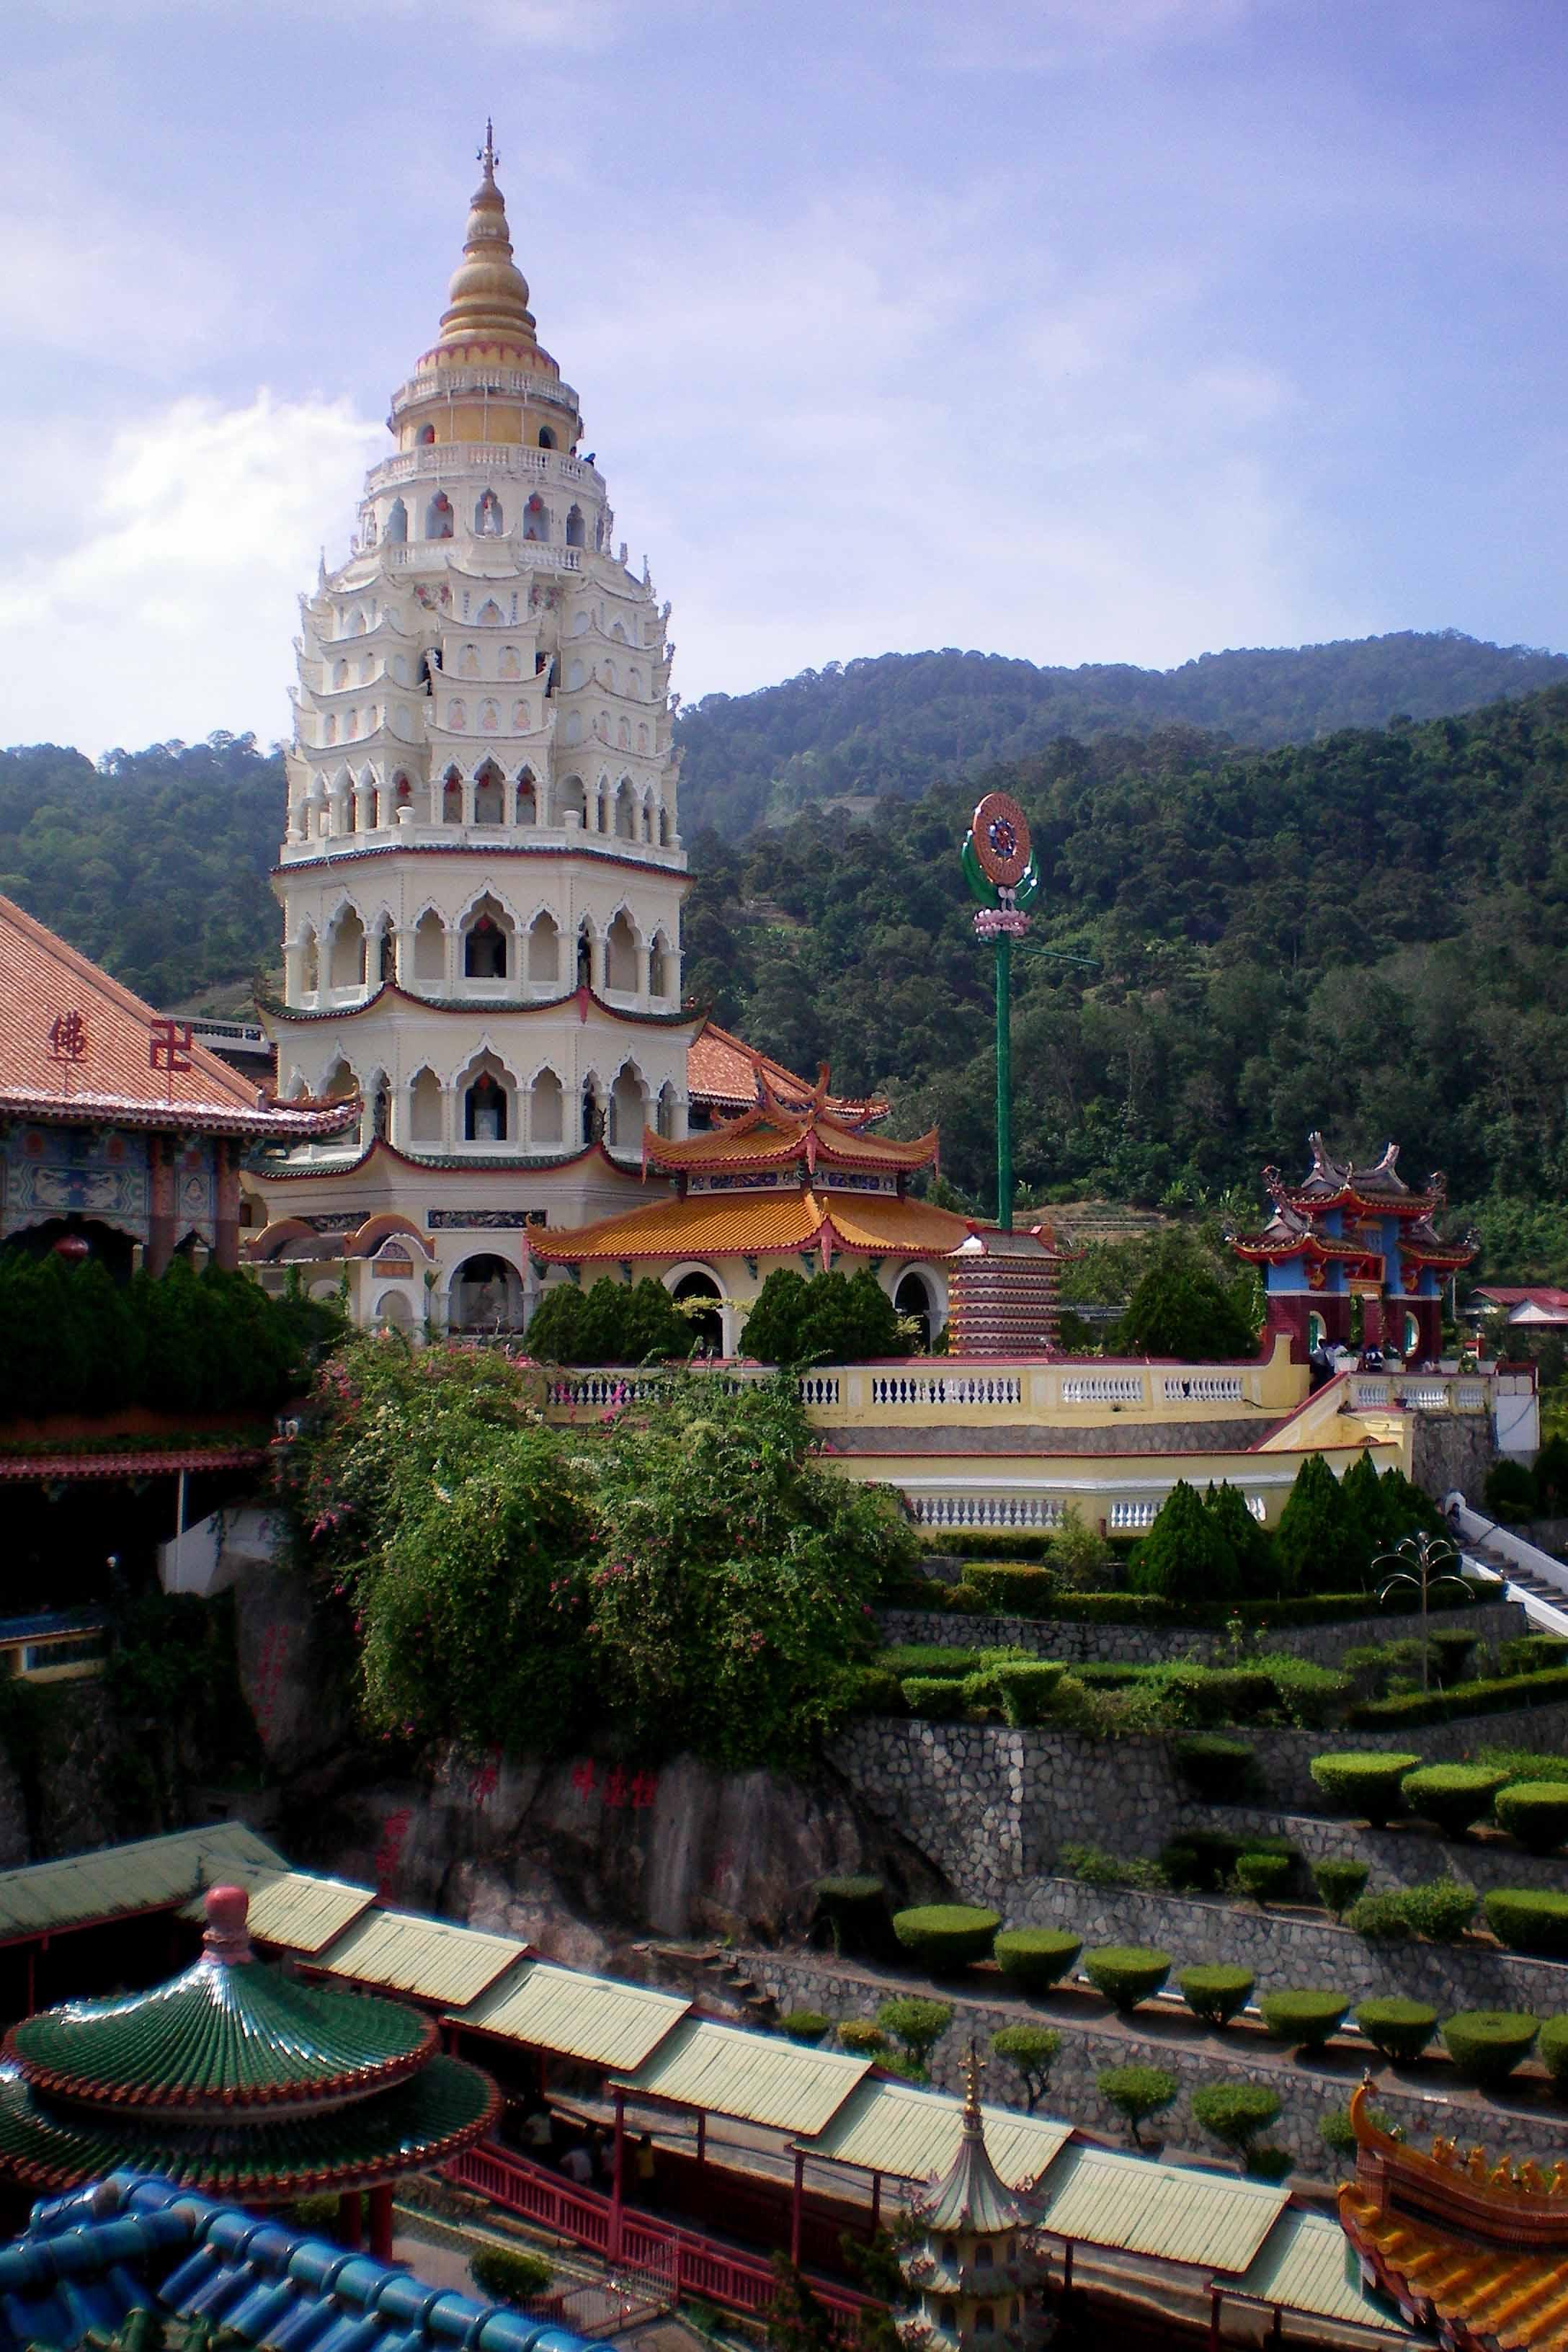 Turm Kek Lok Si